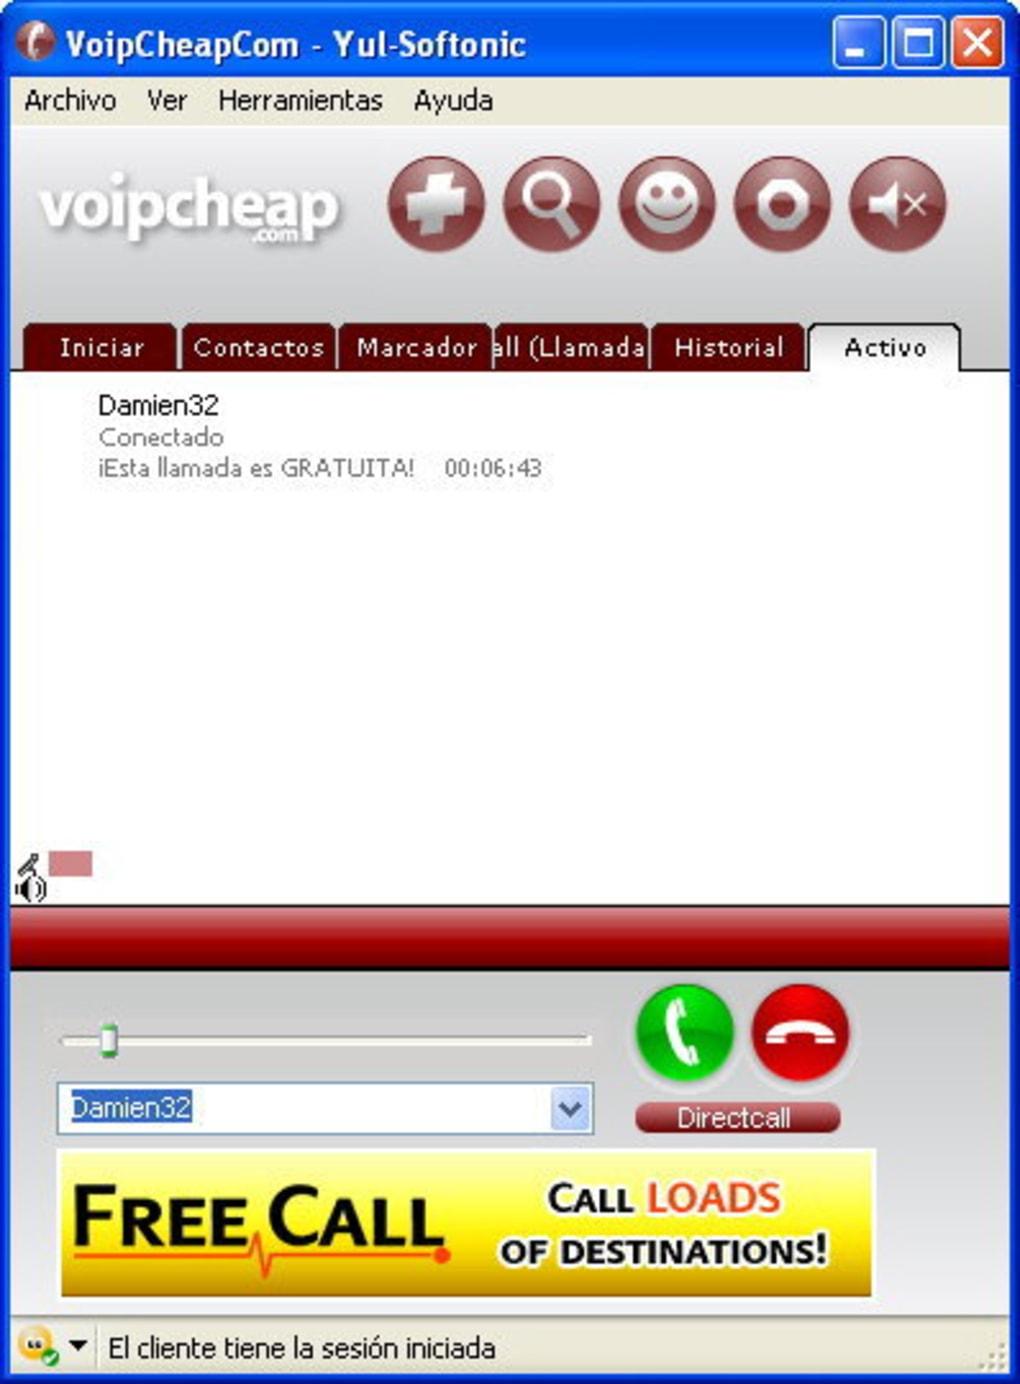 logiciel voipcheap